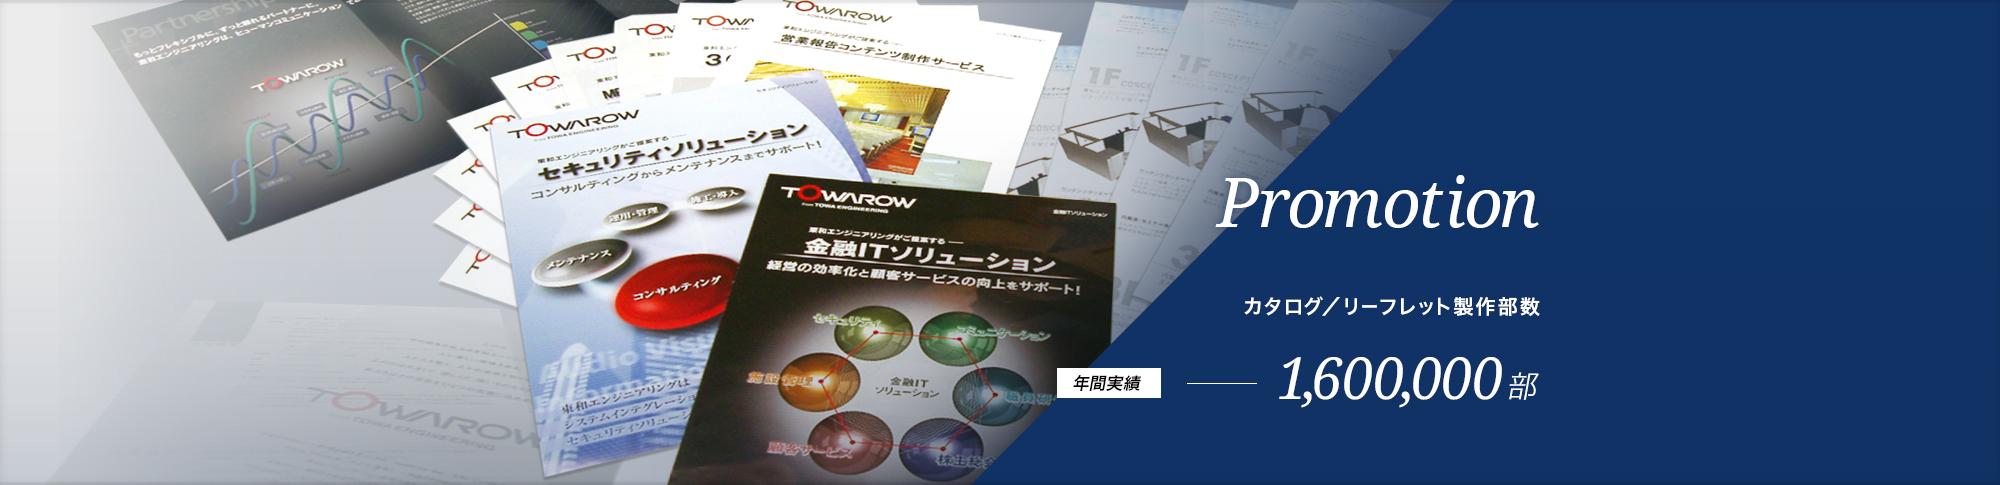 Promotion カタログ/リーフレット製作部数 年間実績1,600,000部